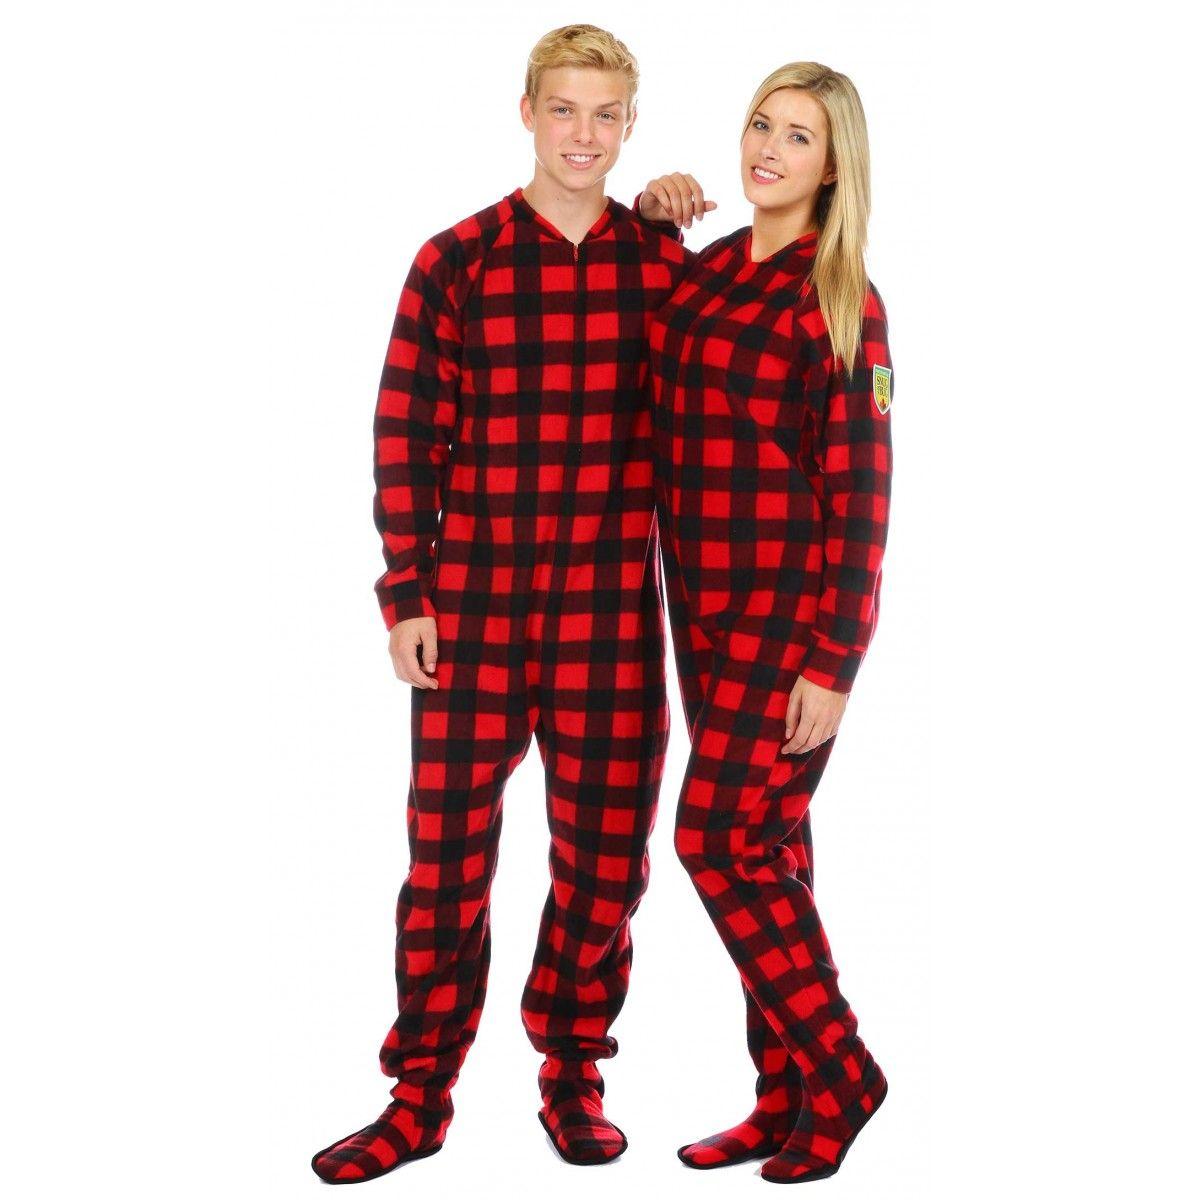 17 Best images about Pajamas on Pinterest   Pajamas, Jack ...